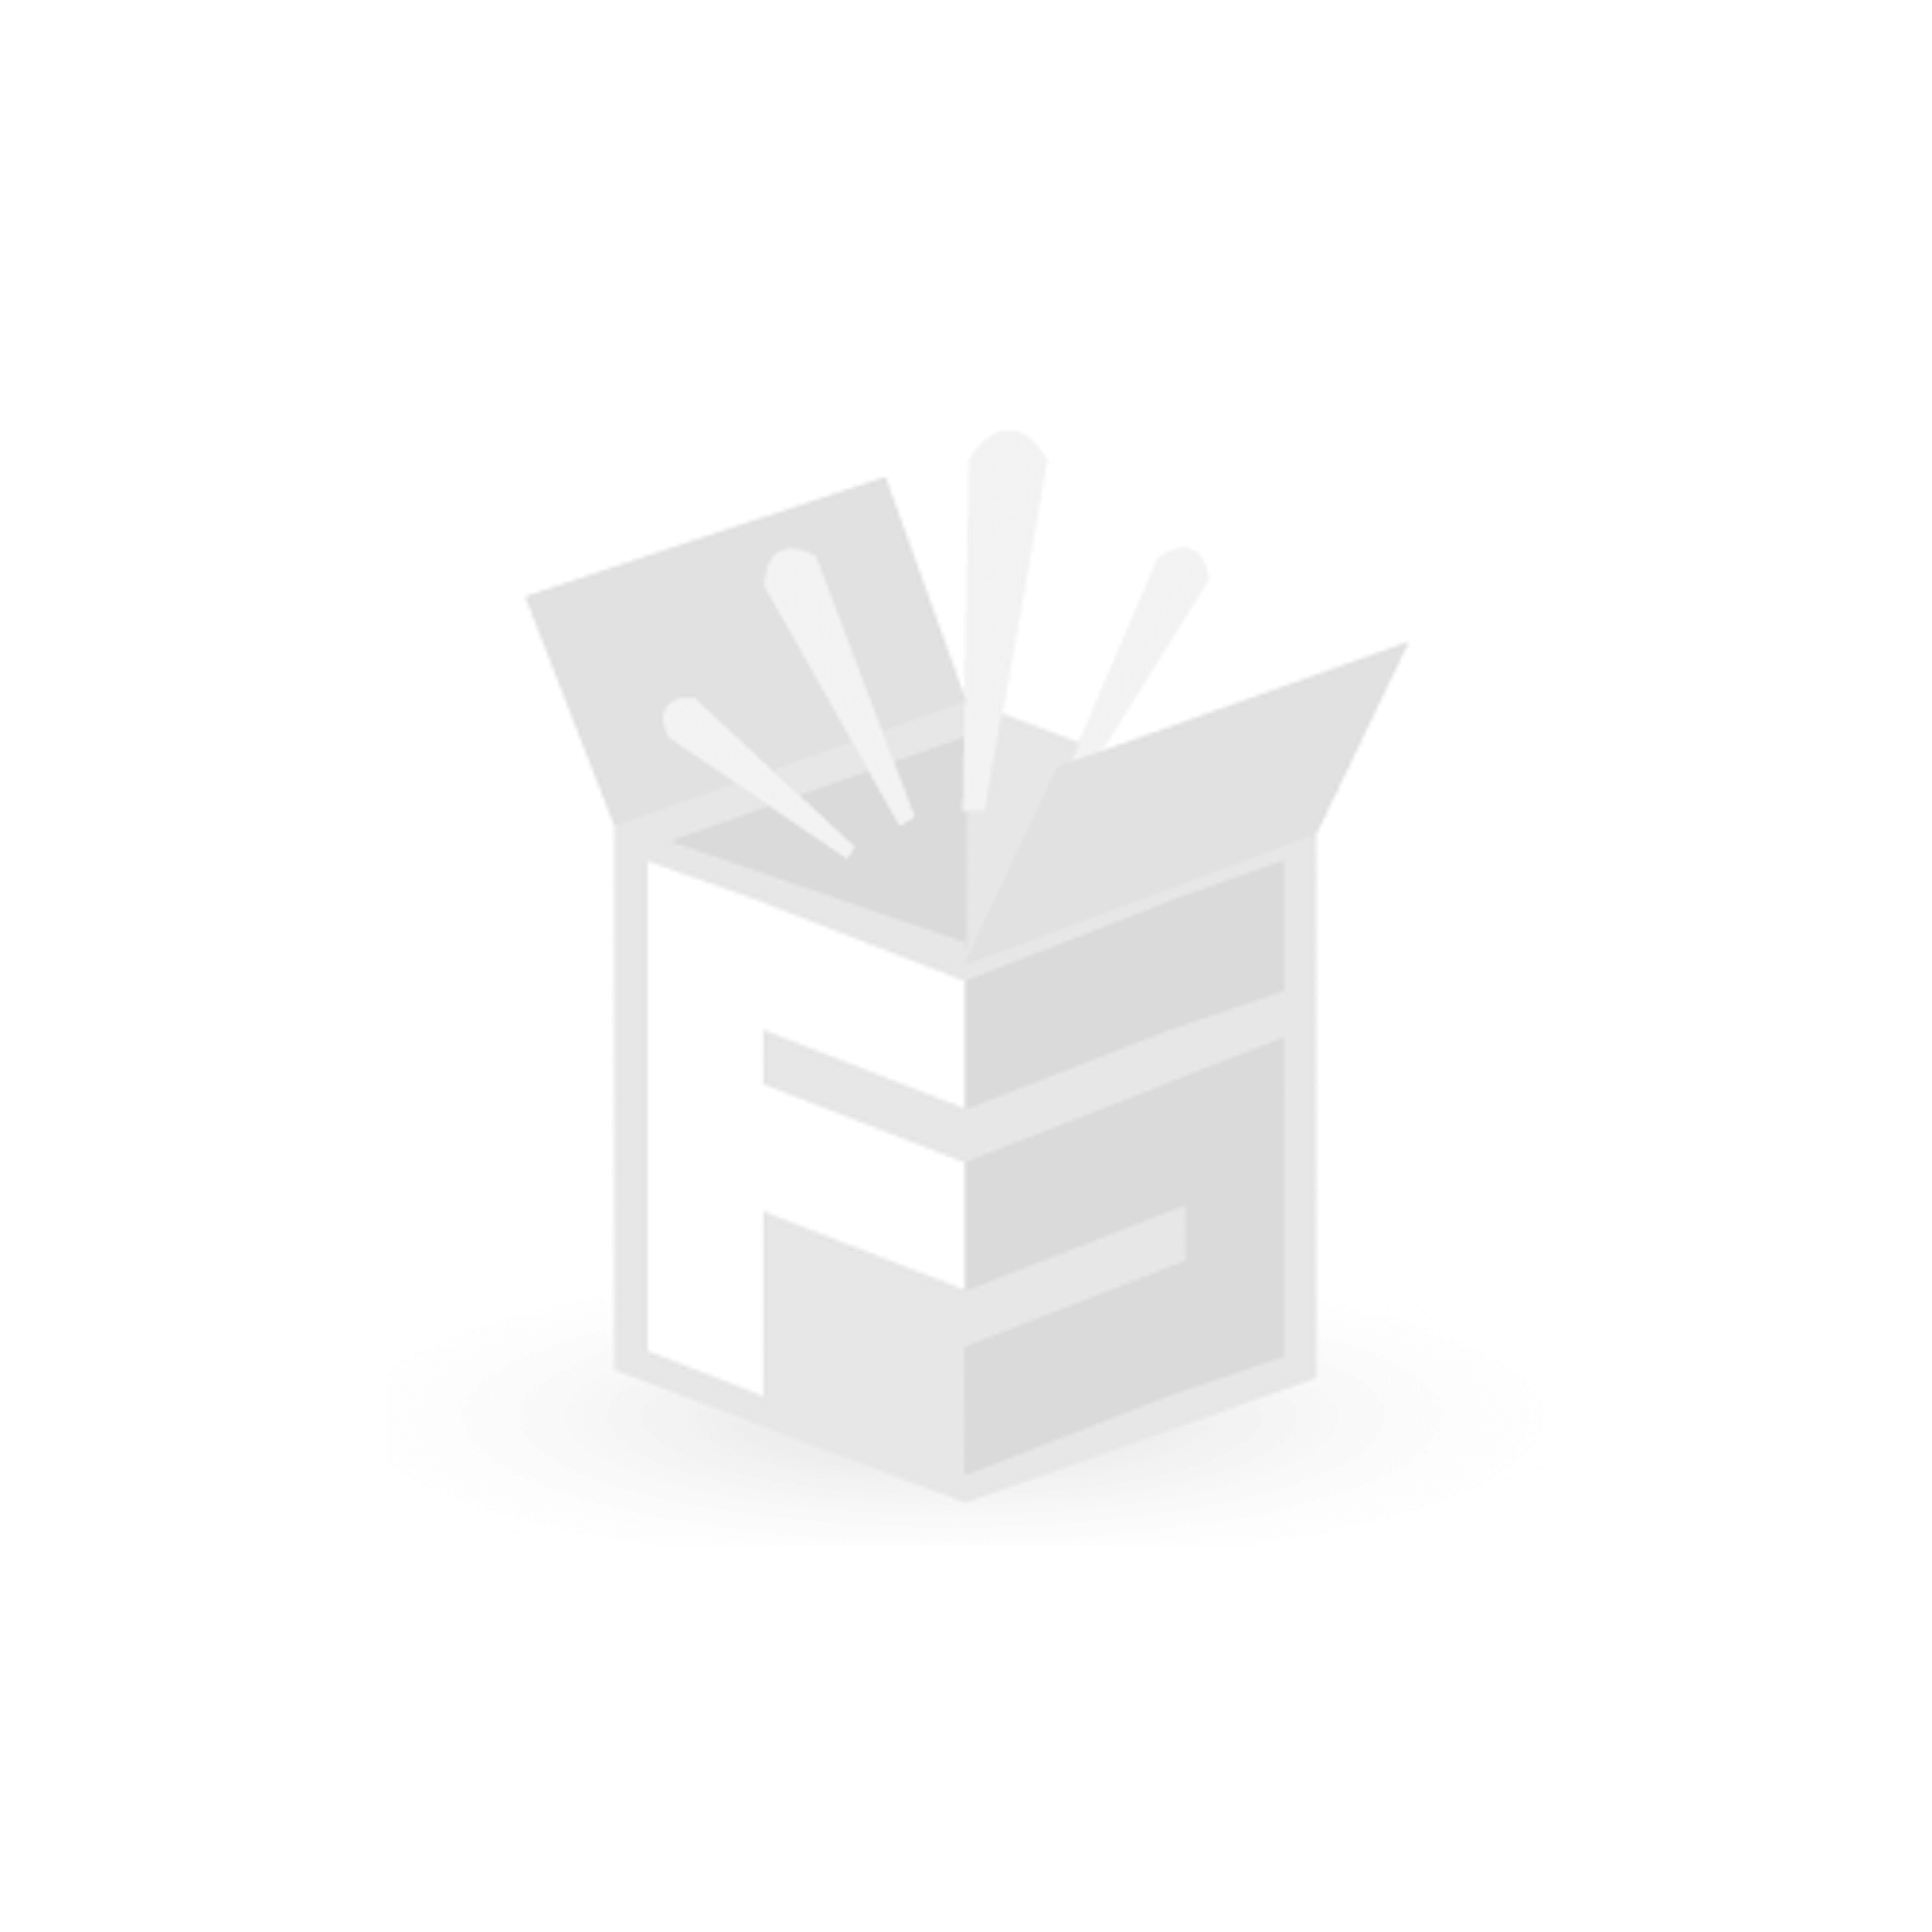 FS-STAR Handymatte, rutschfest, 14 x 8.3 cm